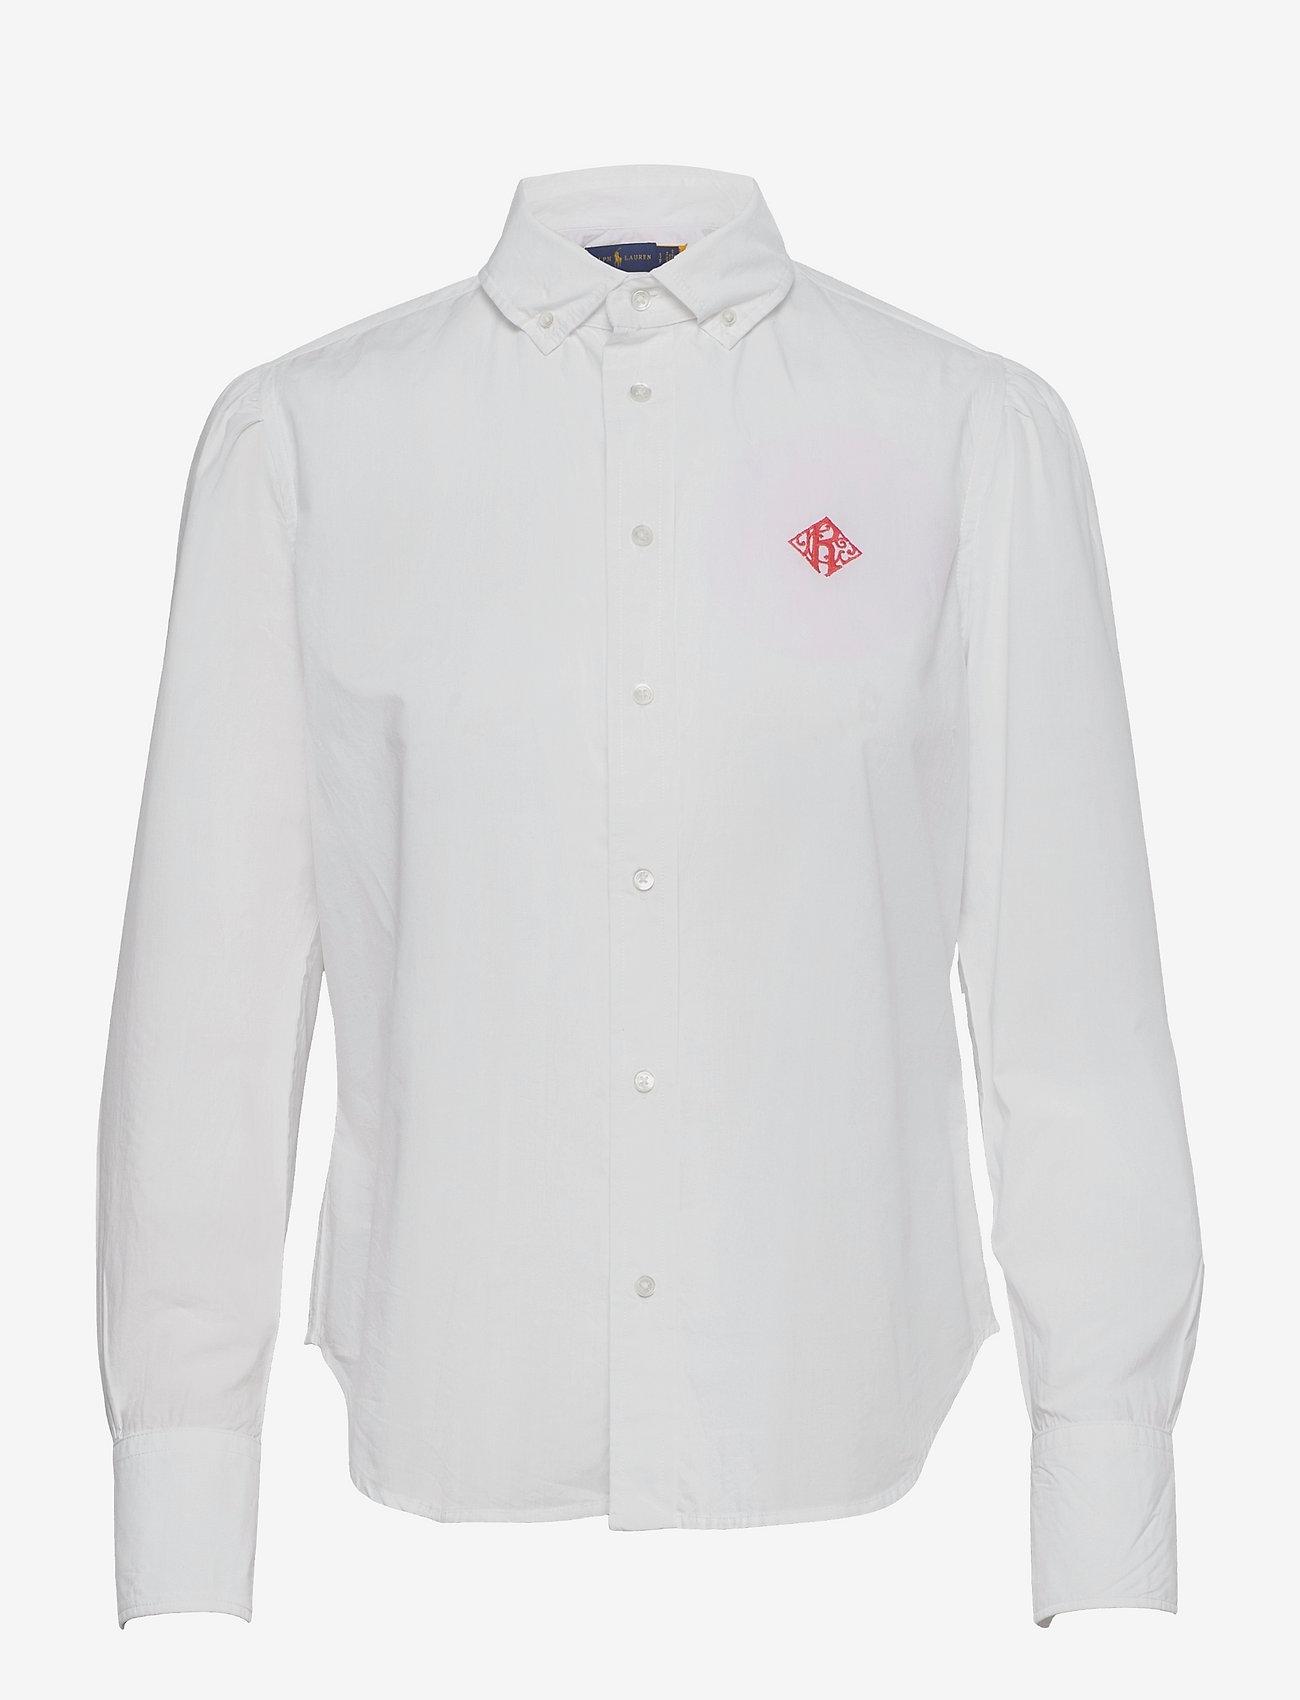 Polo Ralph Lauren - Embroidered-Monogram Cotton Poplin Shirt - long-sleeved shirts - white - 0